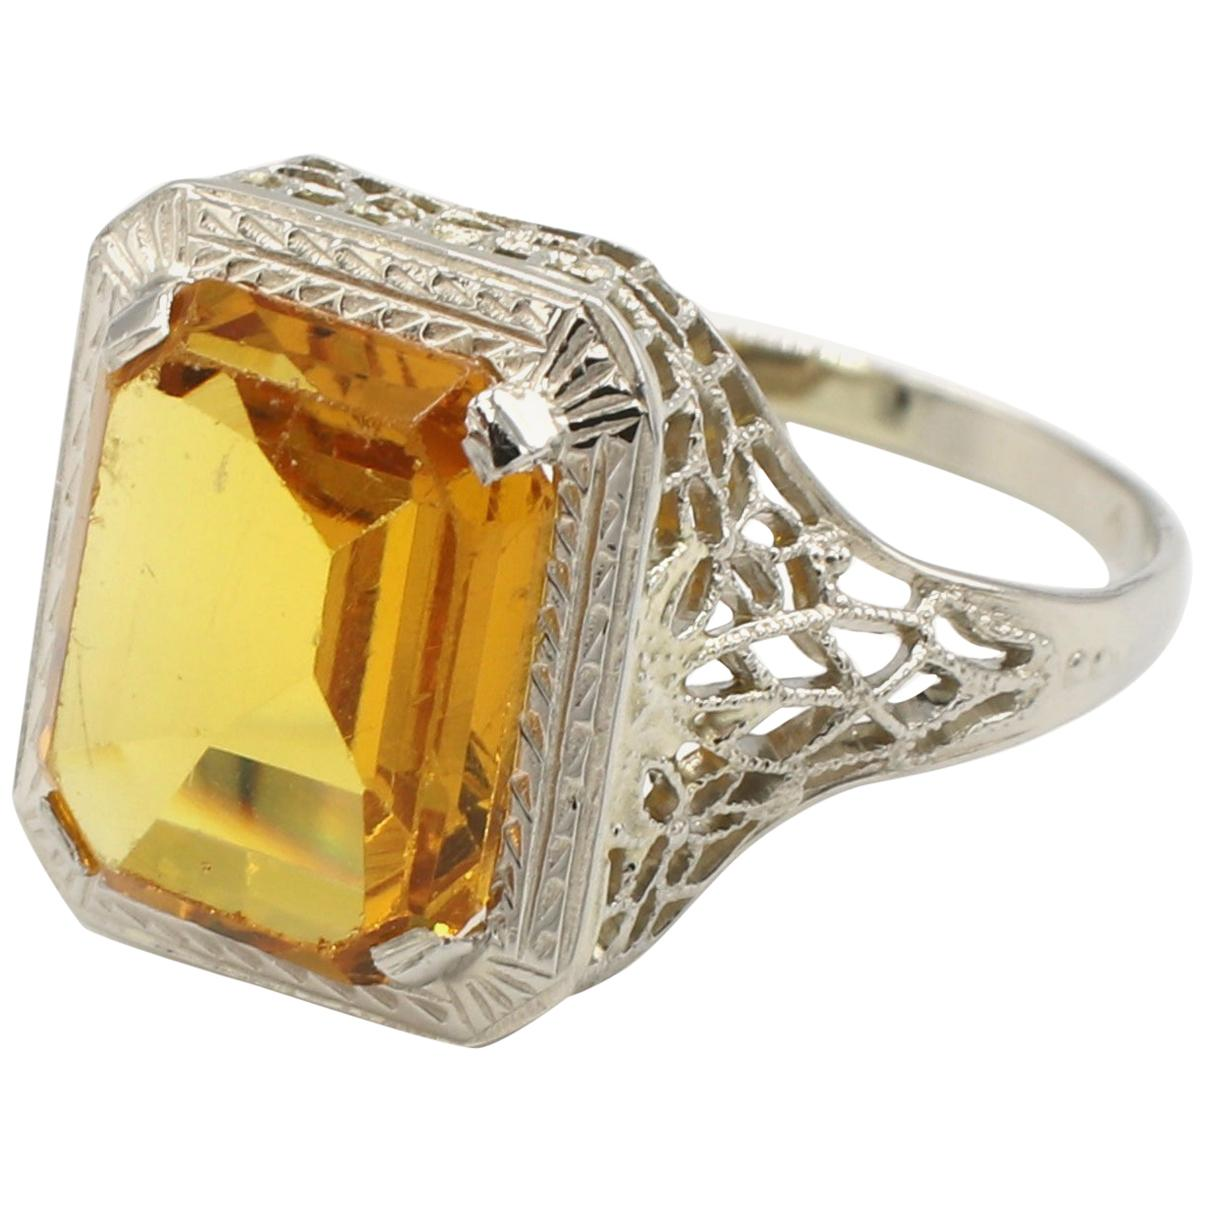 Vintage 14 Karat White Gold Citrine Filigree Design Cocktail Ring